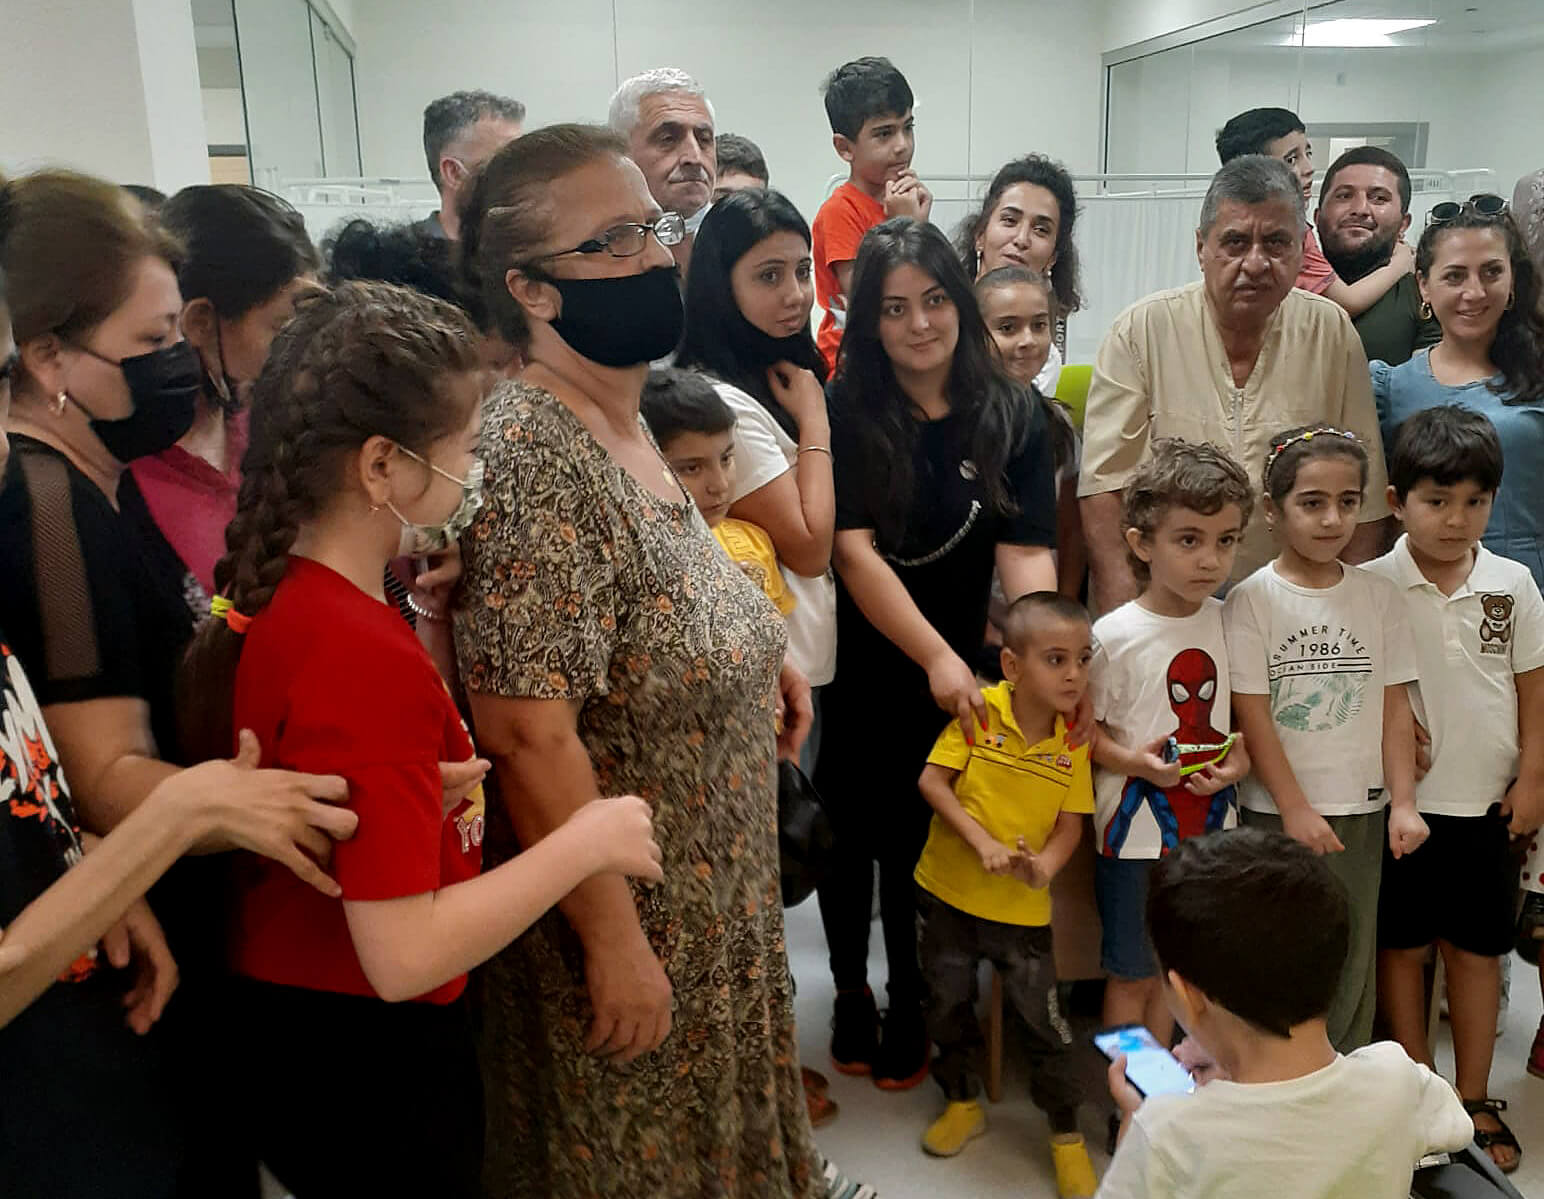 Фото на память. Профессор Рахманов с пациентами. Август 2021, г. Баку, Азербайджан